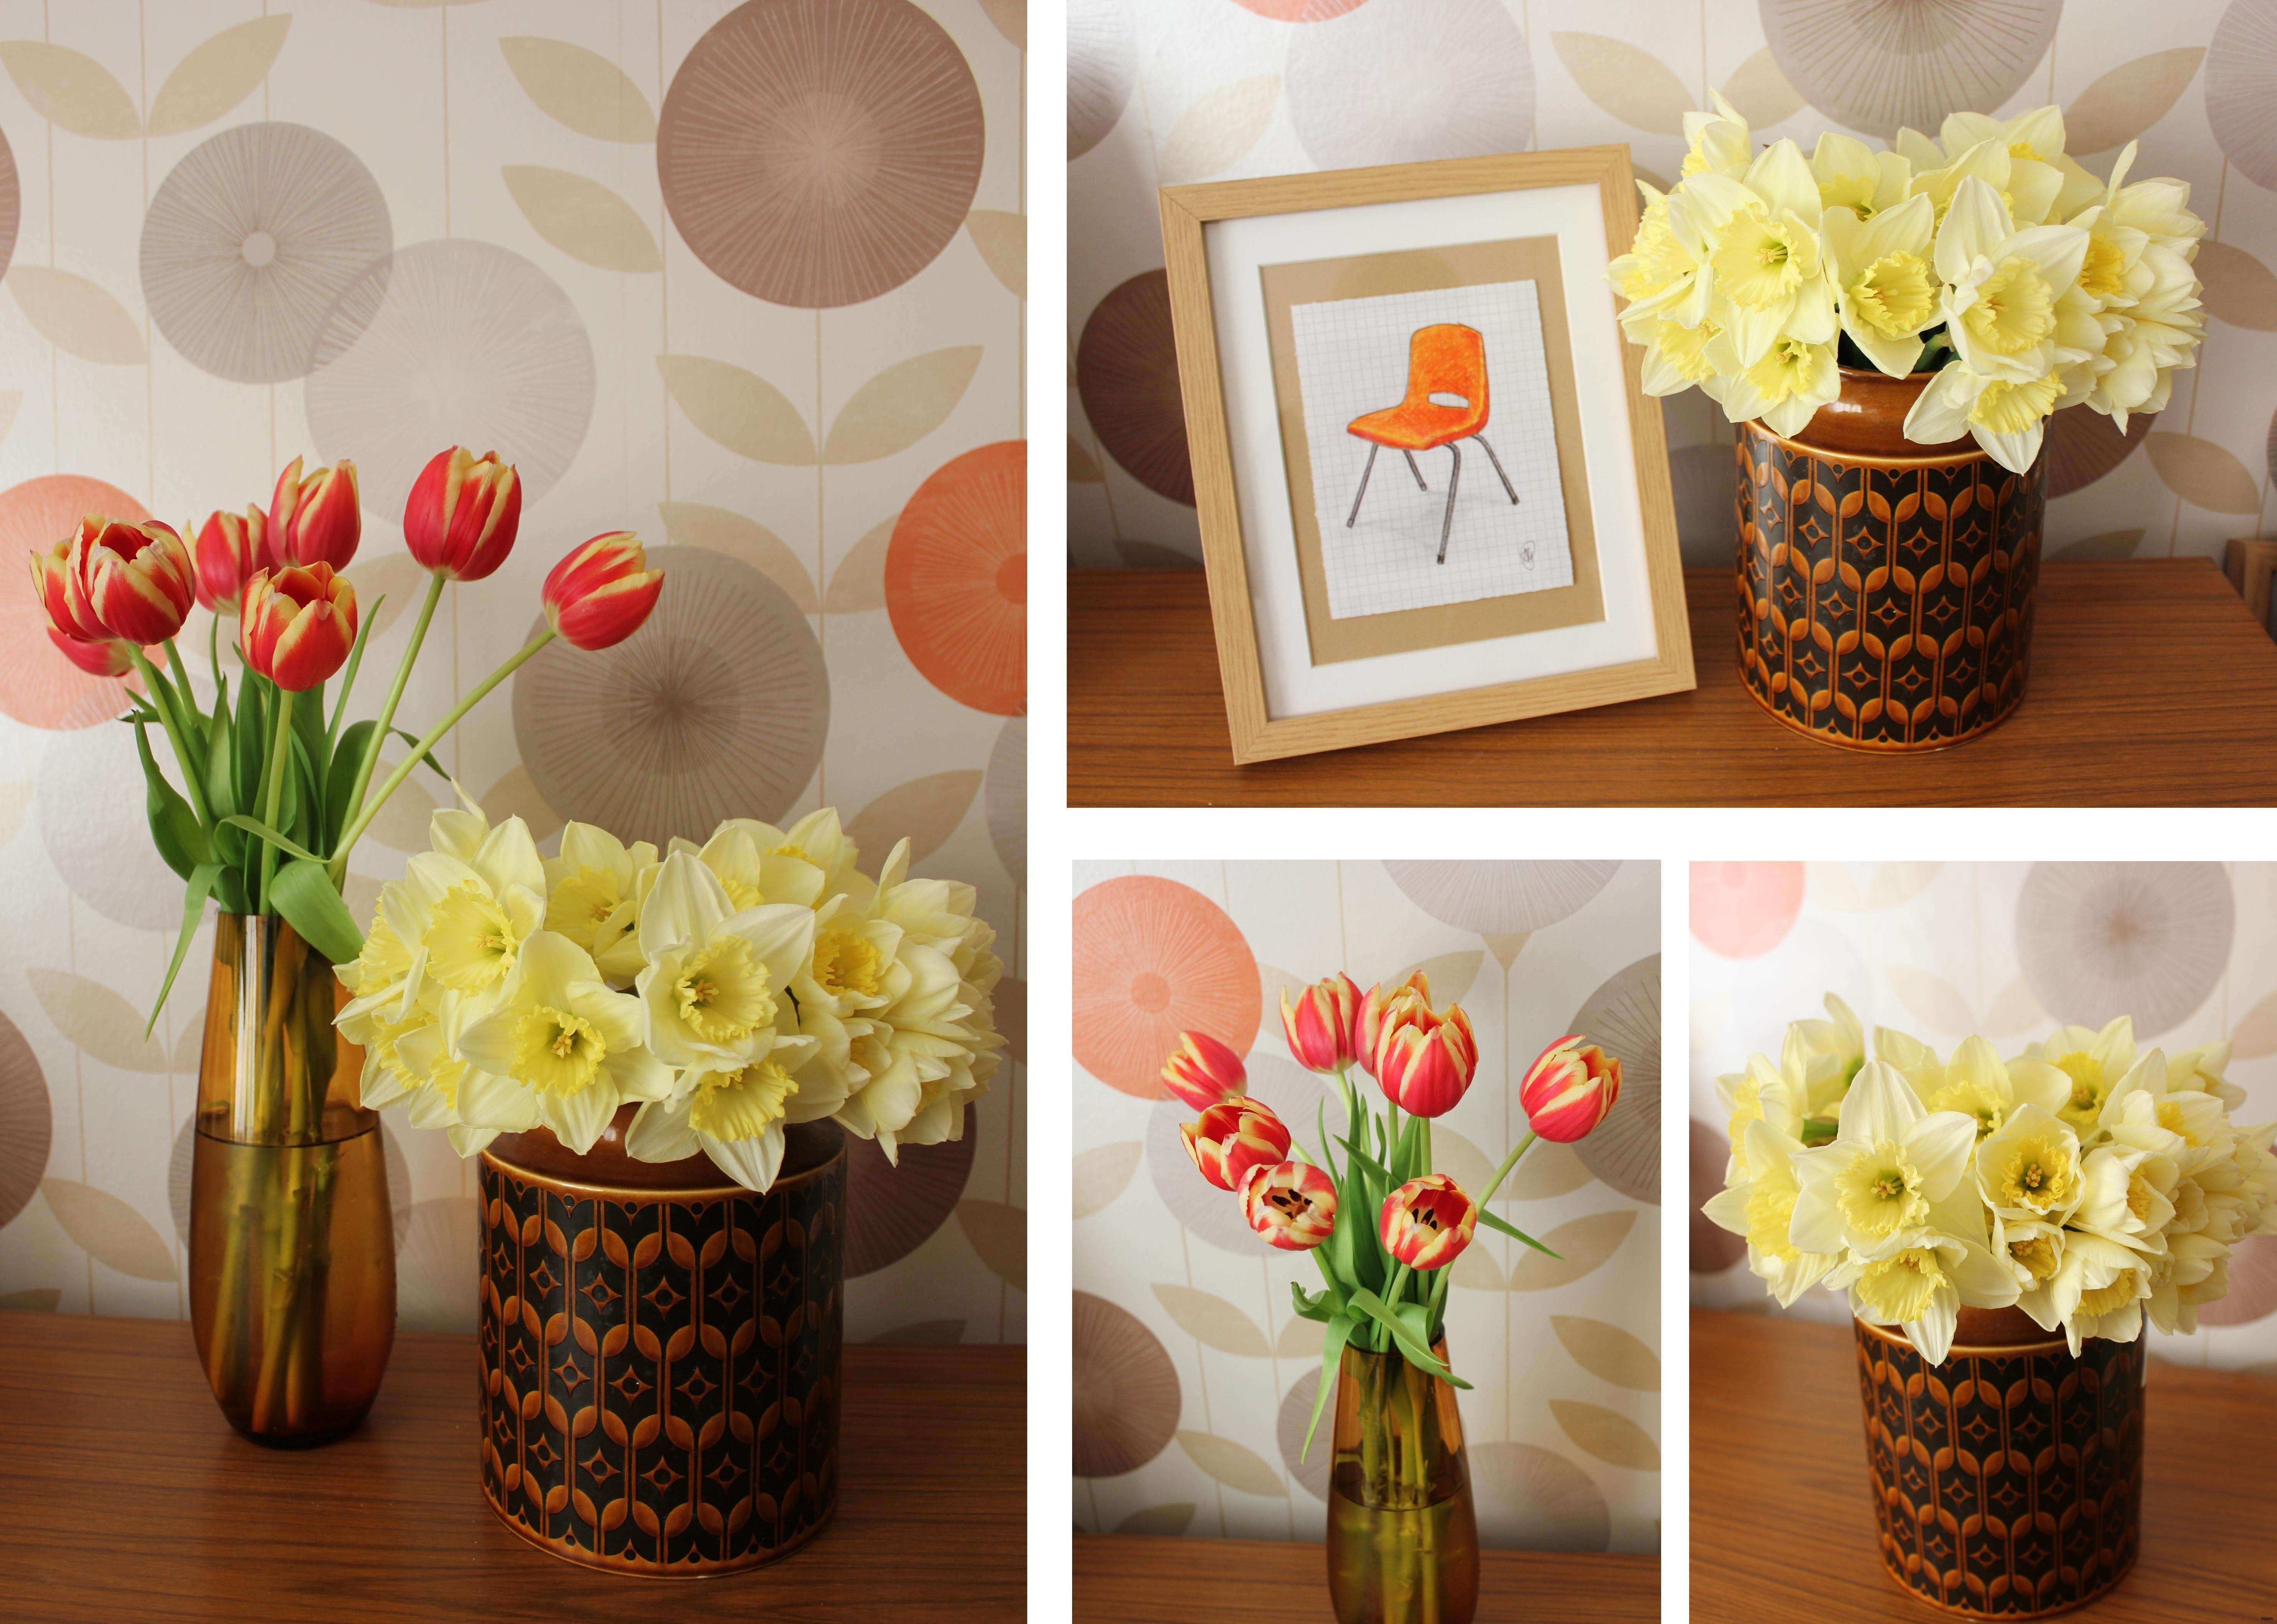 Sunflower Clipart Lovely Diy Home Decor Vaseh Vases Decorative Flower Ideas I 0d Design Ideas